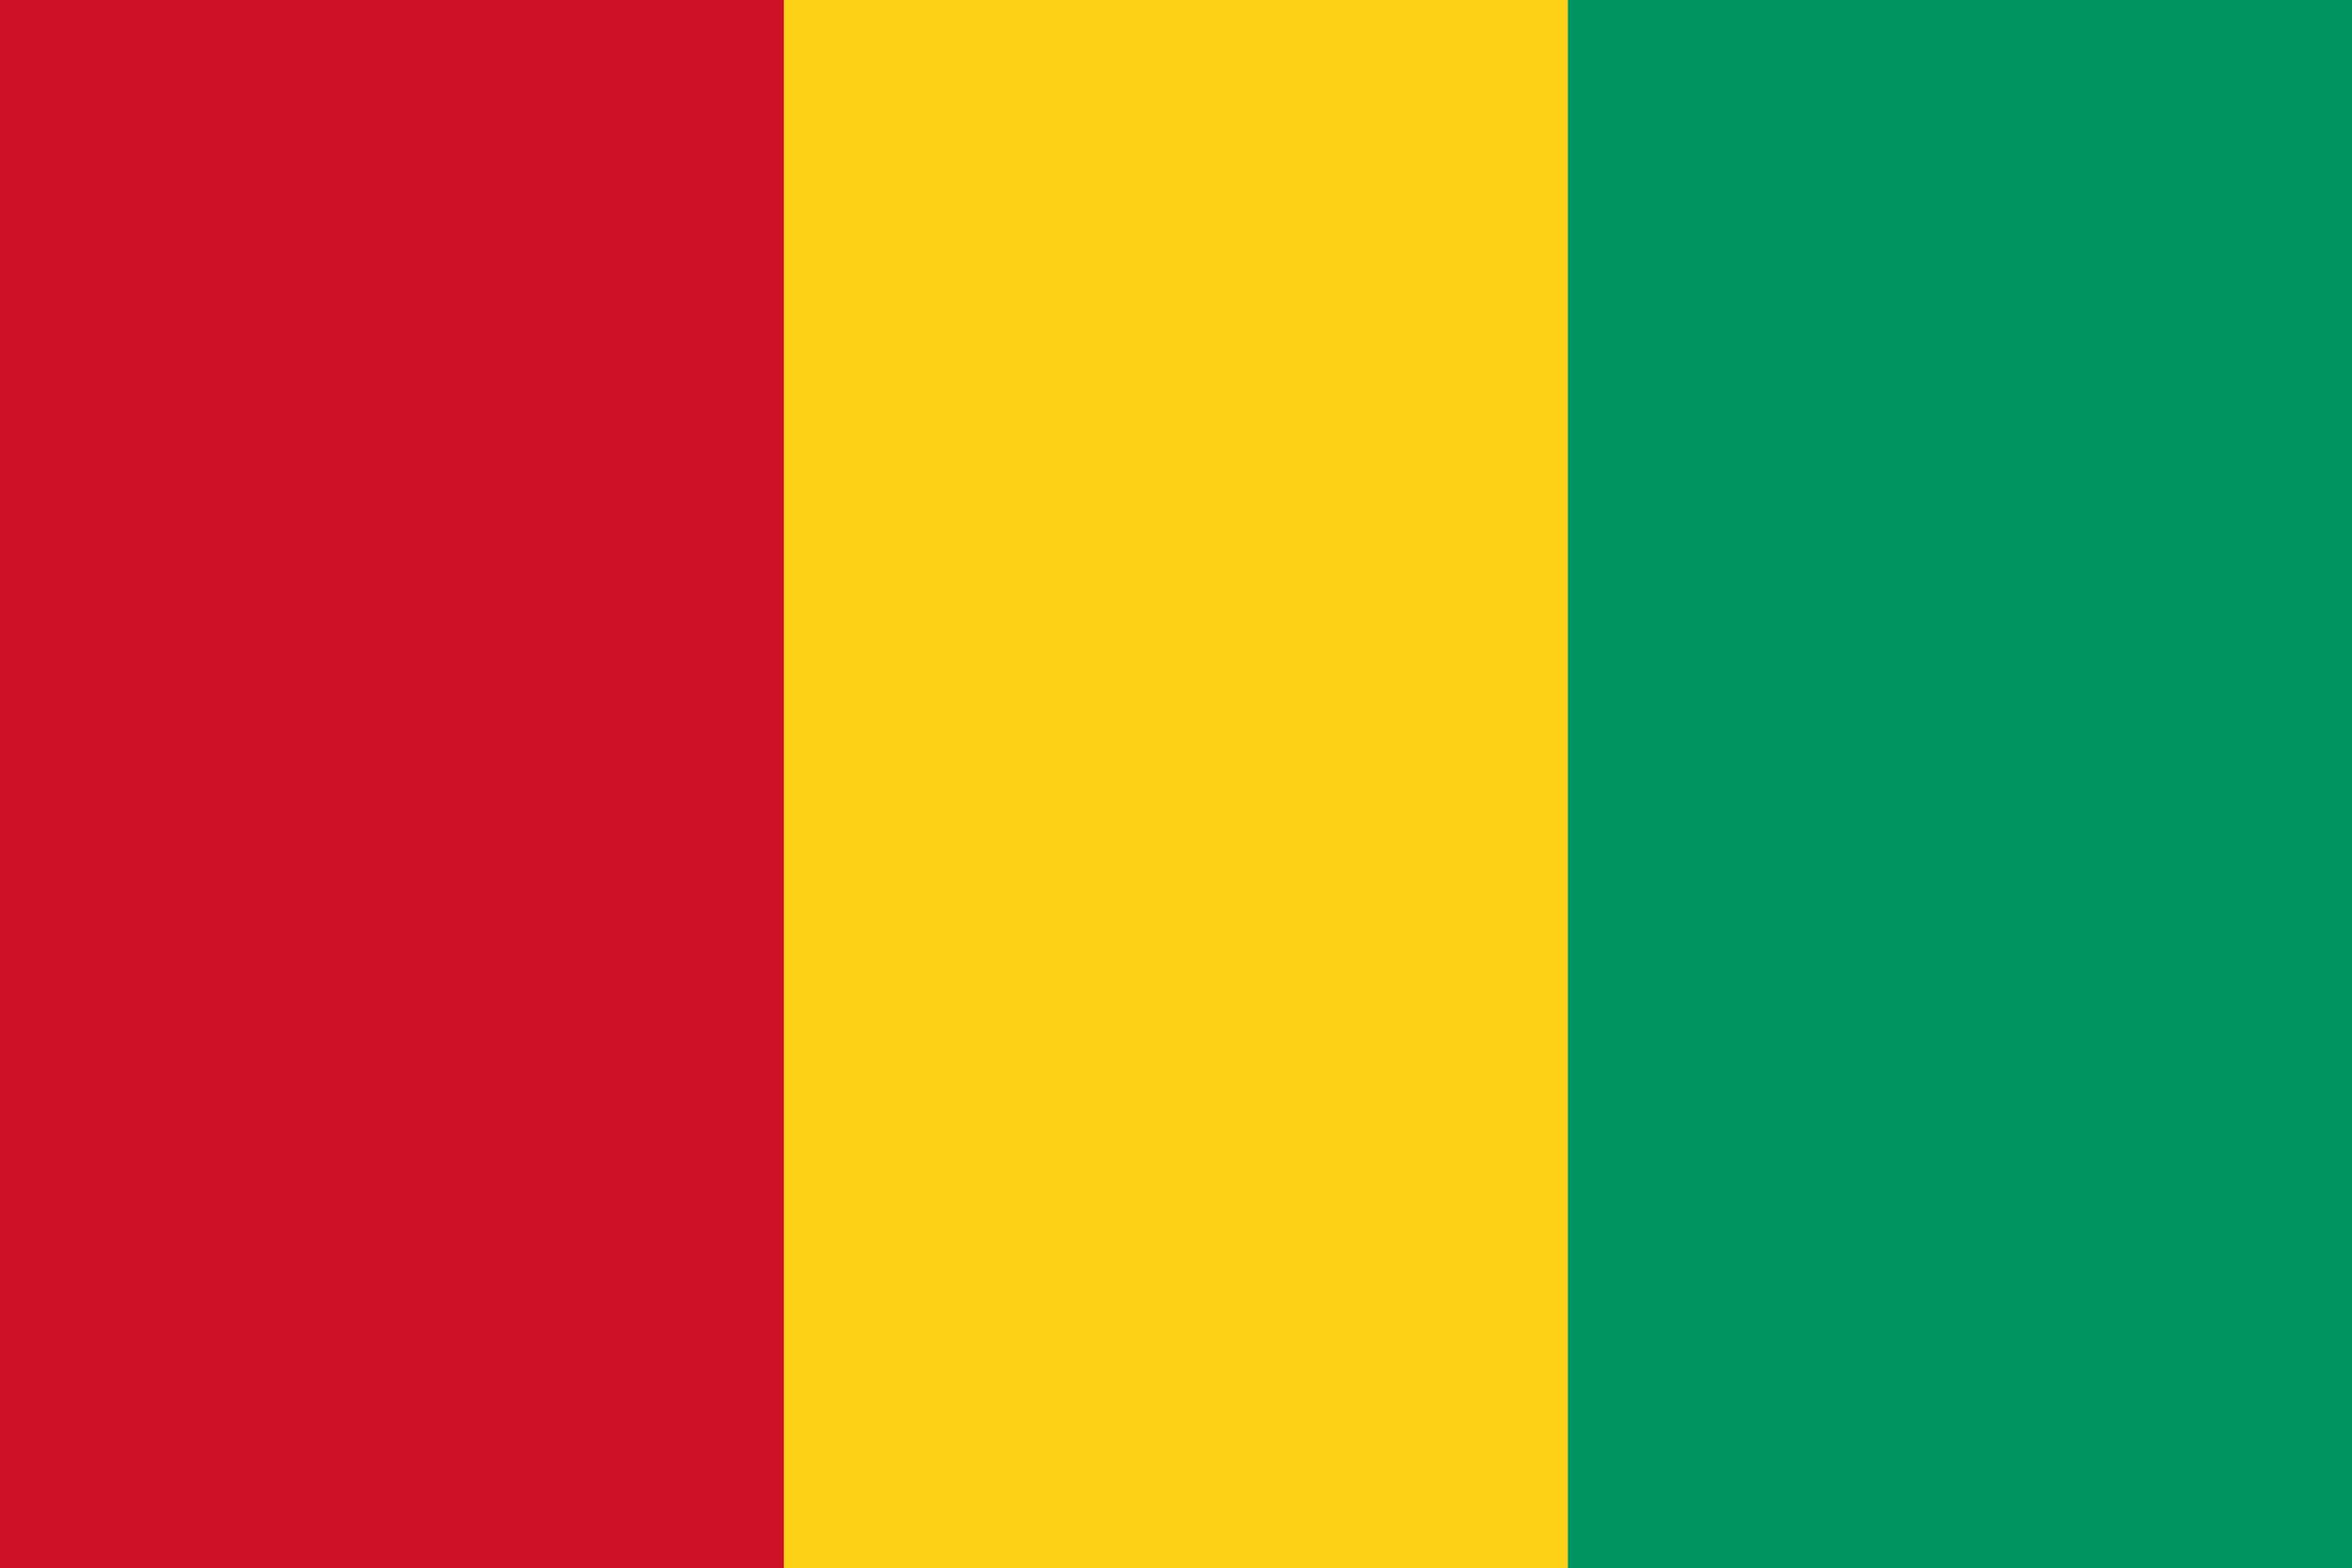 guinea, pays, emblème, logo, symbole - Fonds d'écran HD - Professor-falken.com